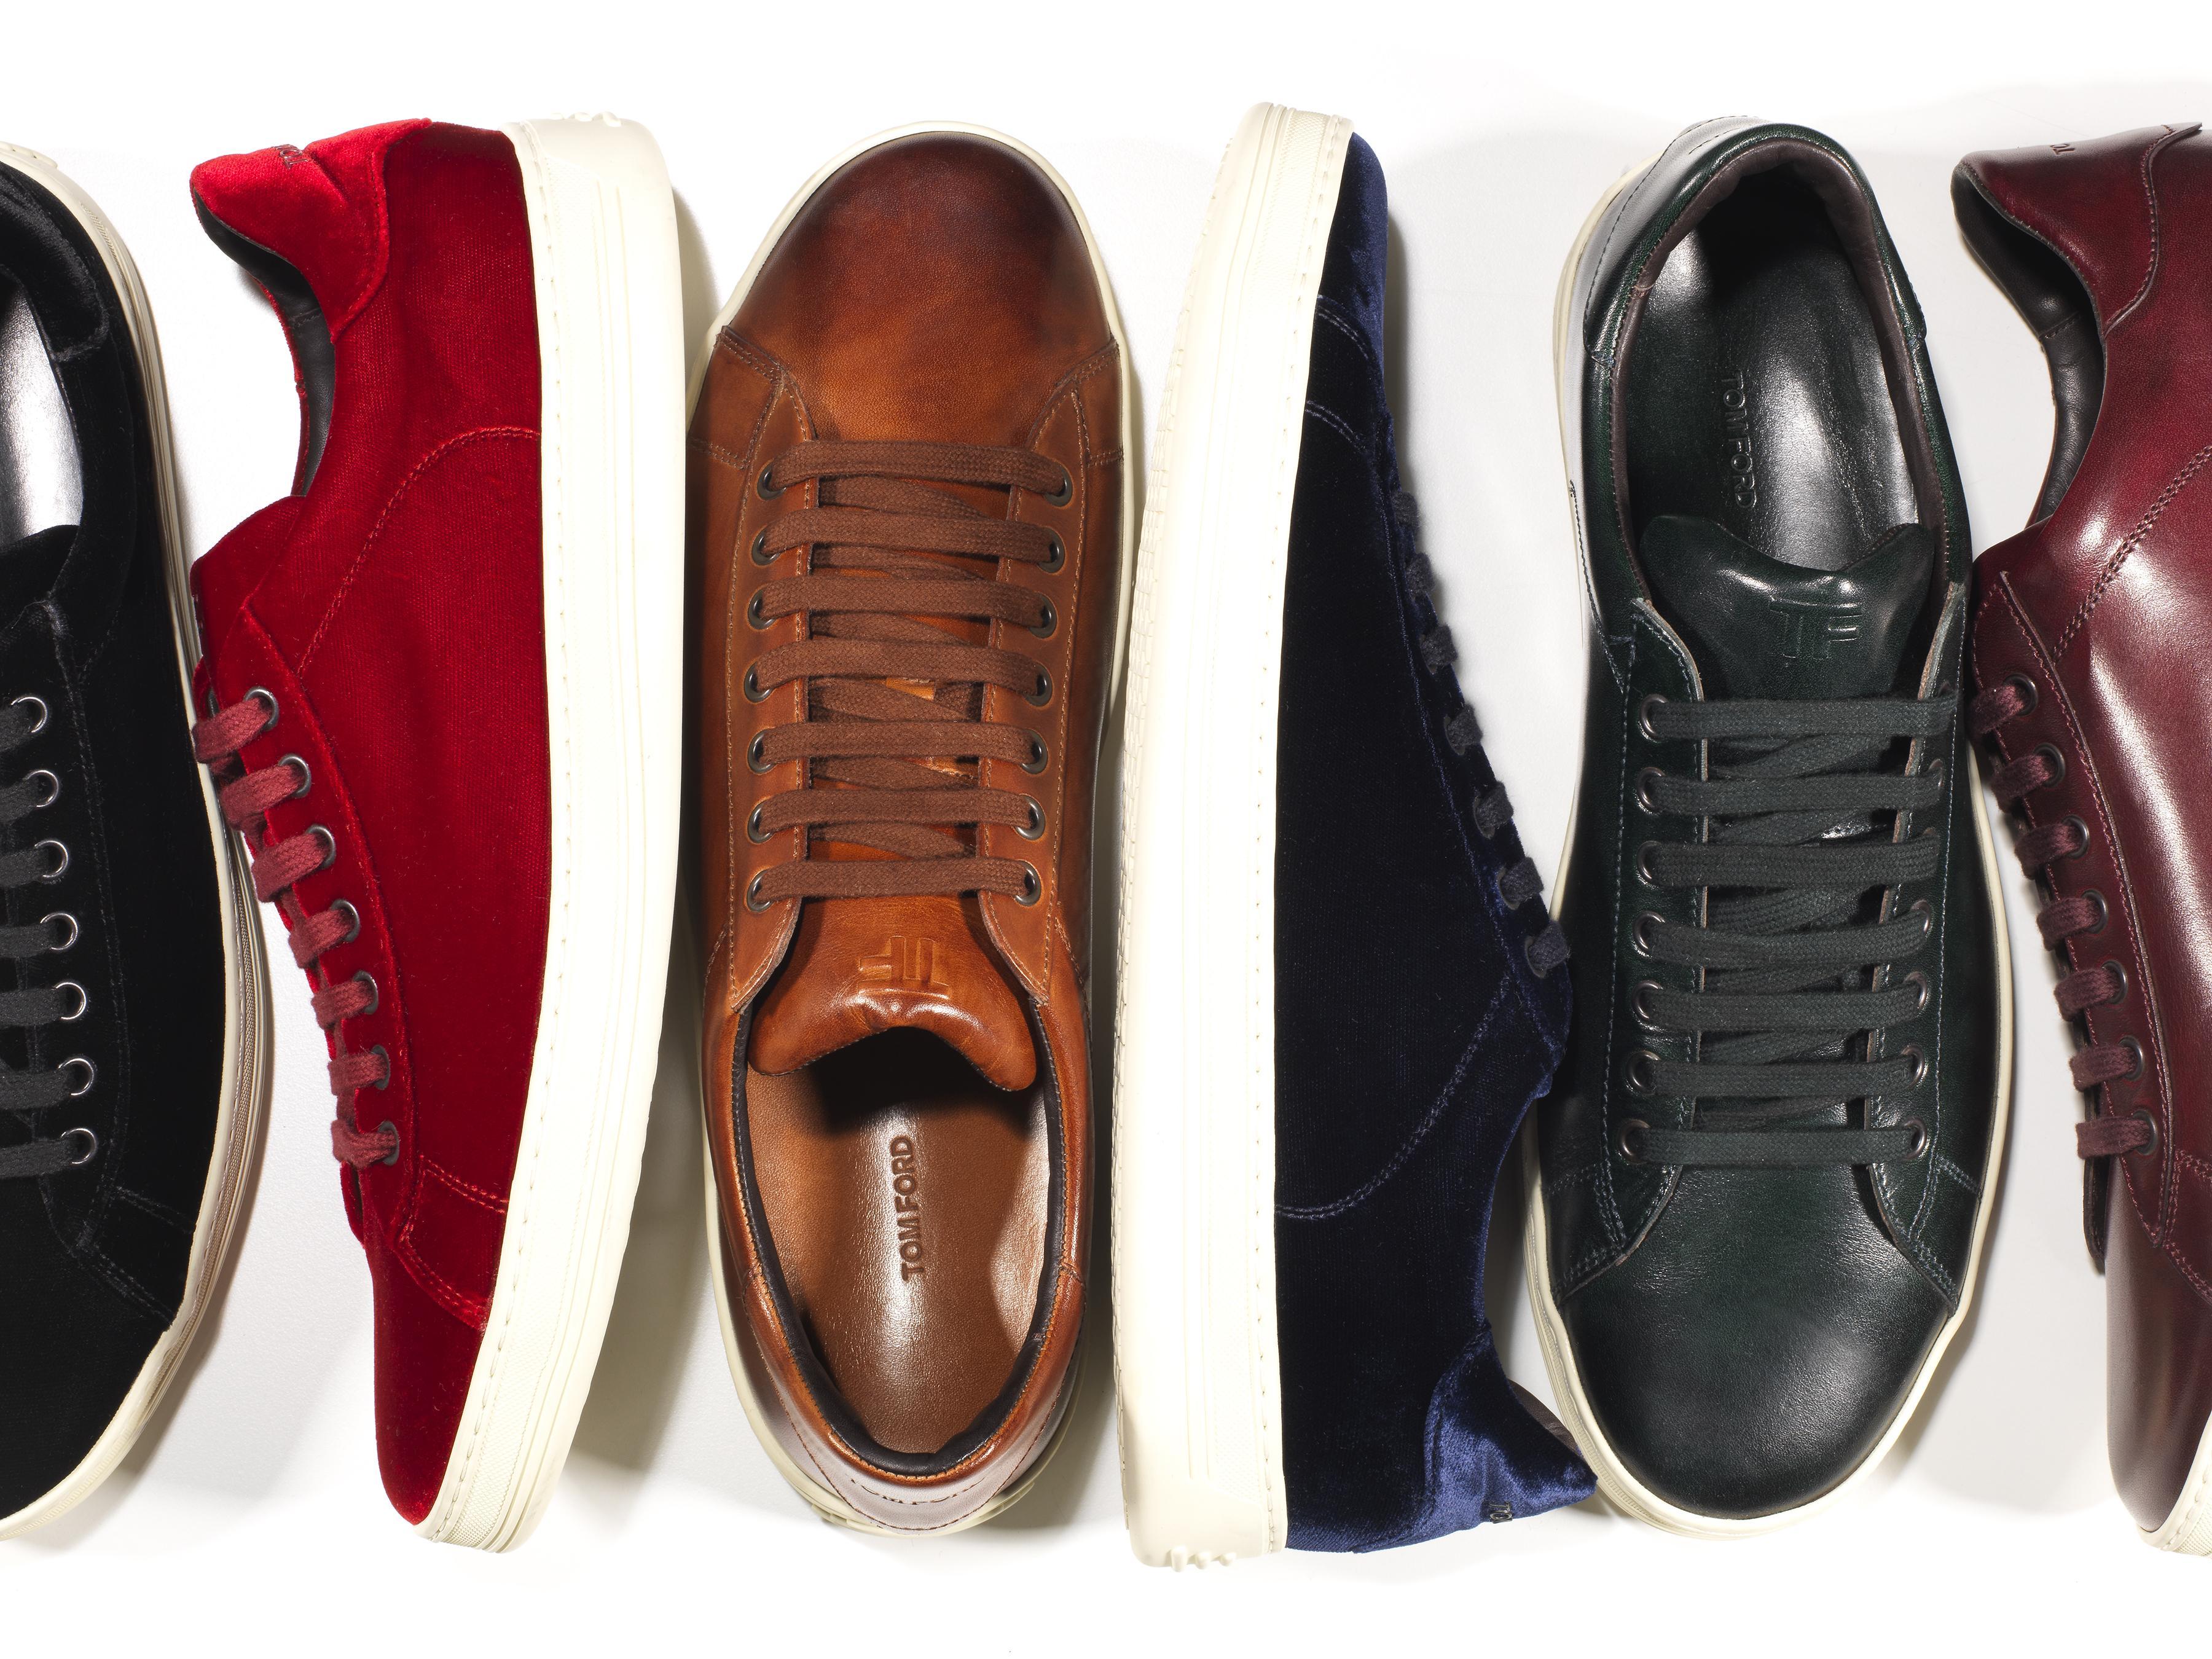 Men Tom Ford Loafers SHJKY8xn fashion shoes break down price on sales